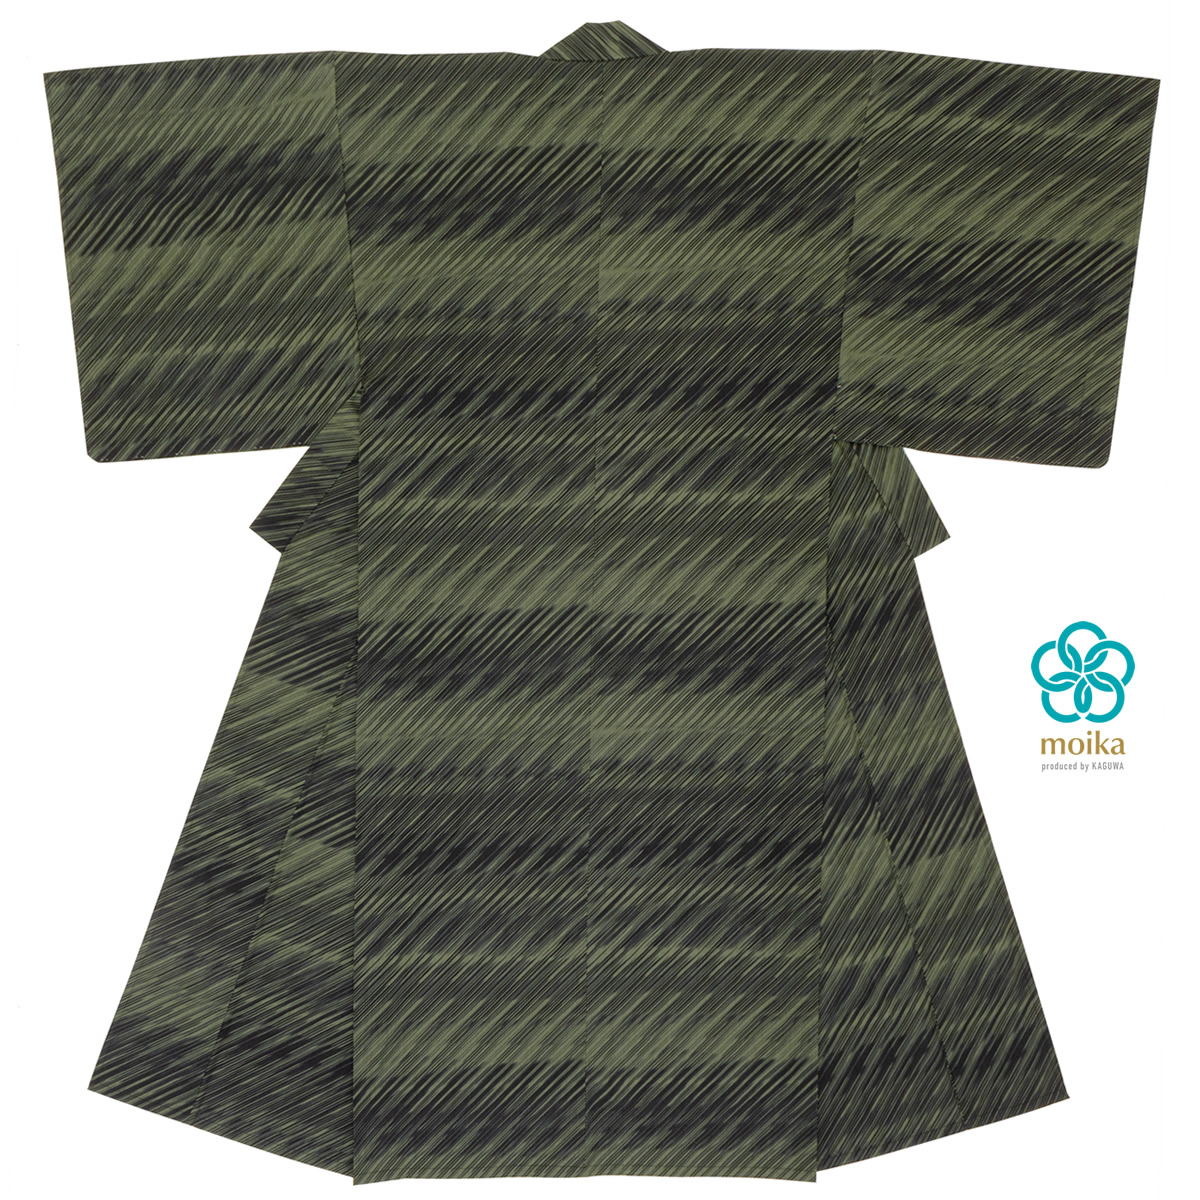 moika 浴衣 メンズ 単品 Mサイズ Lサイズ レトロ 大人 緑 カーキ 雨 ストライプ 男性用 仕立て上がり